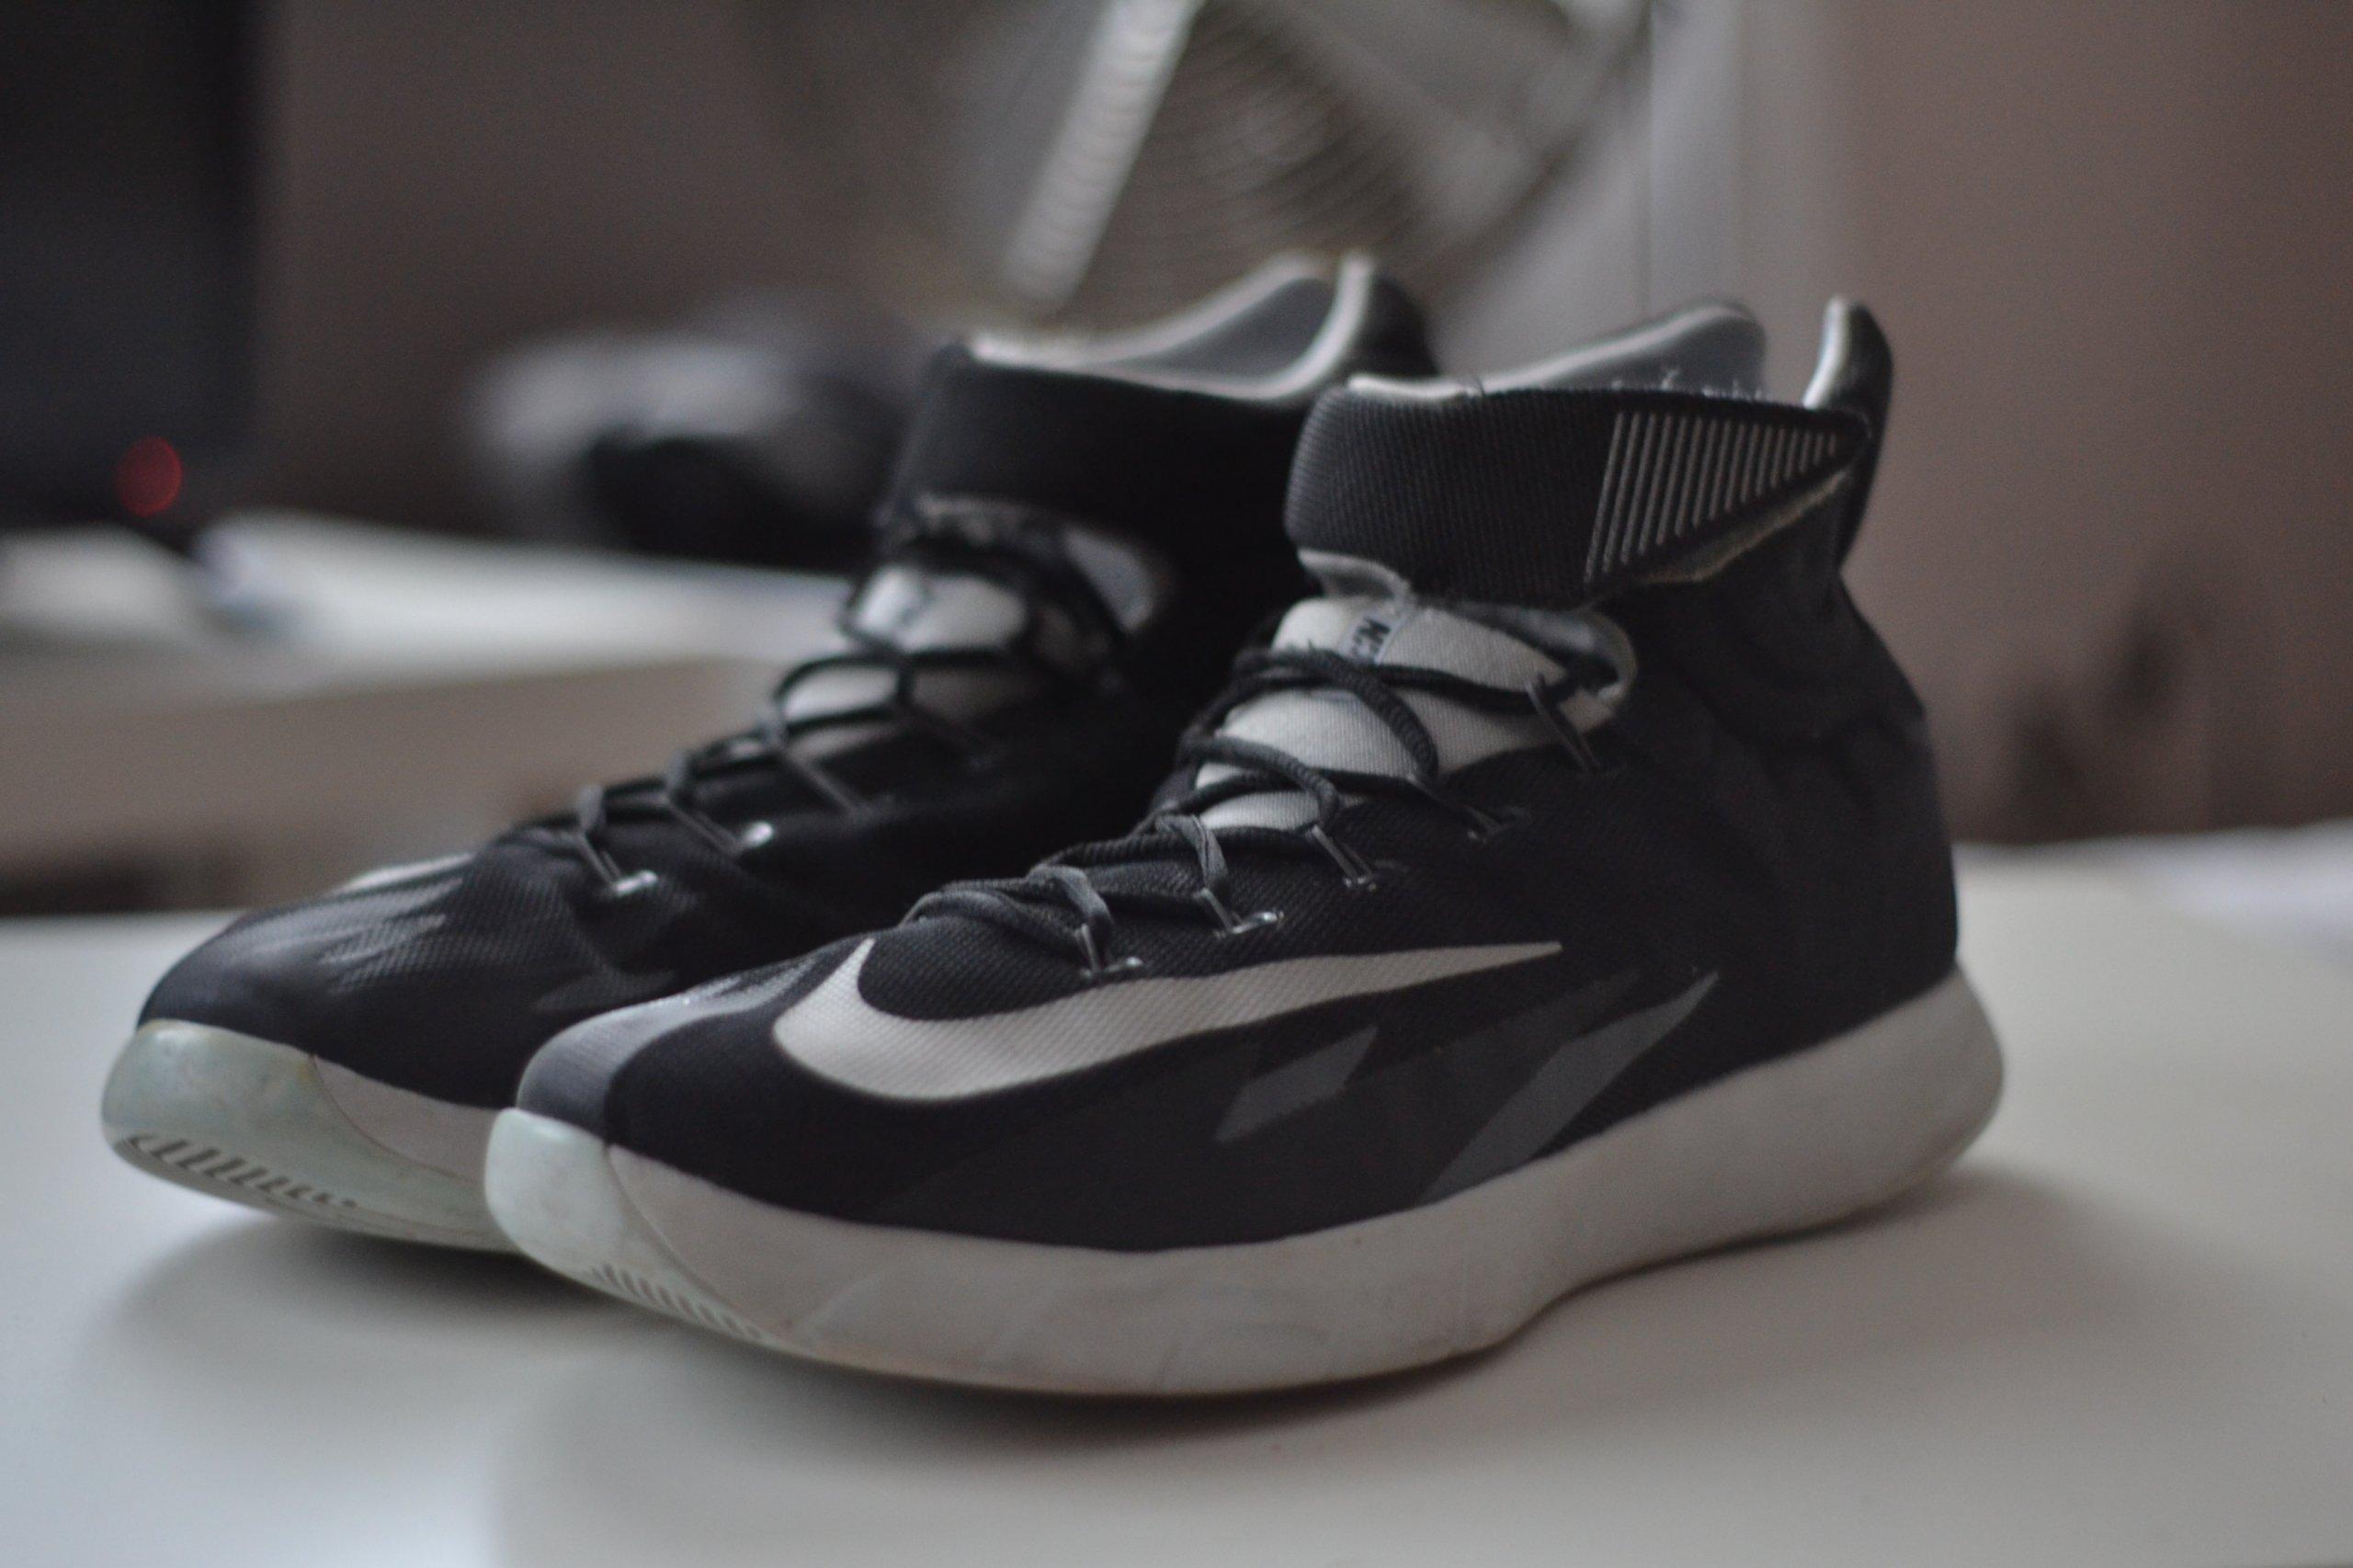 Nike Hyperrev 48 lebron jordan retro kobe kd buty